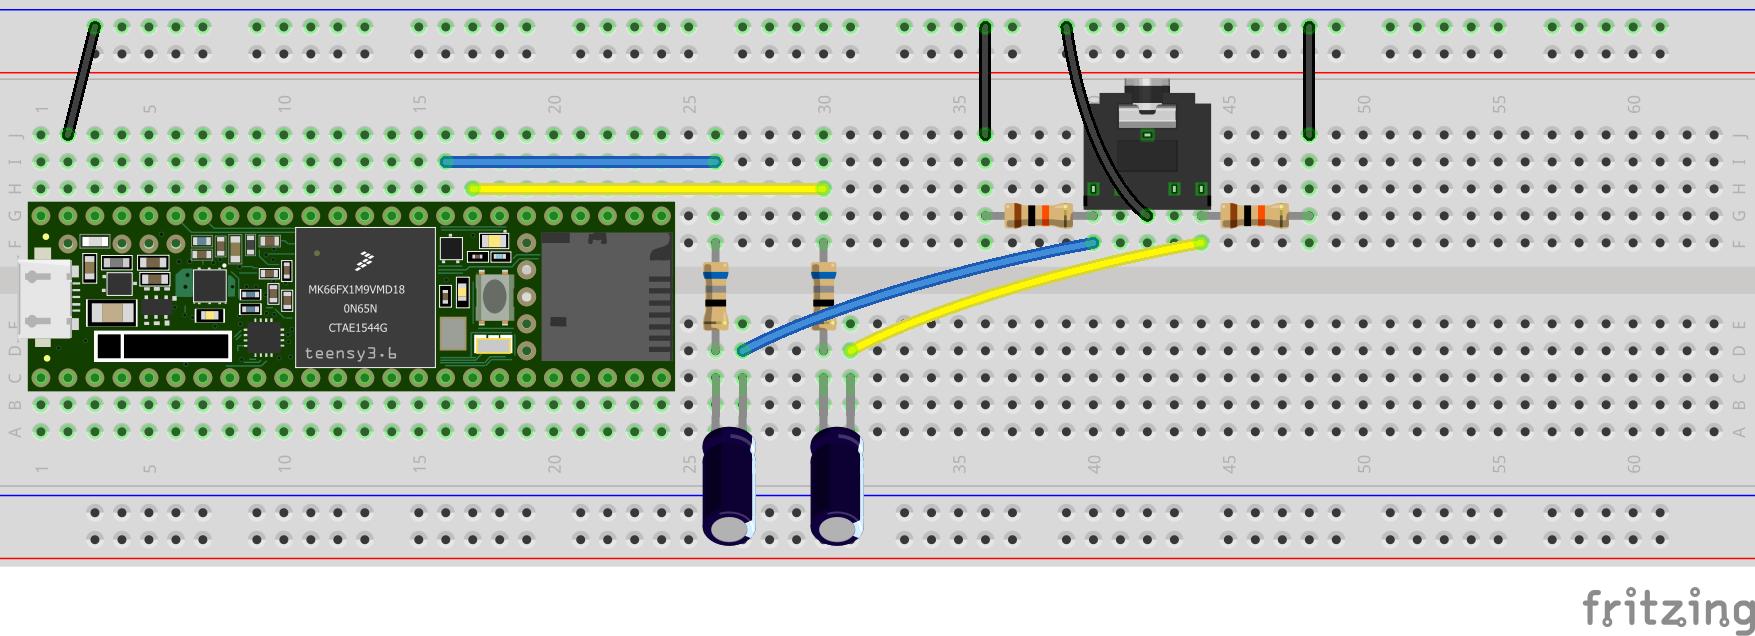 microcontrollers_teensymp3_bb.png